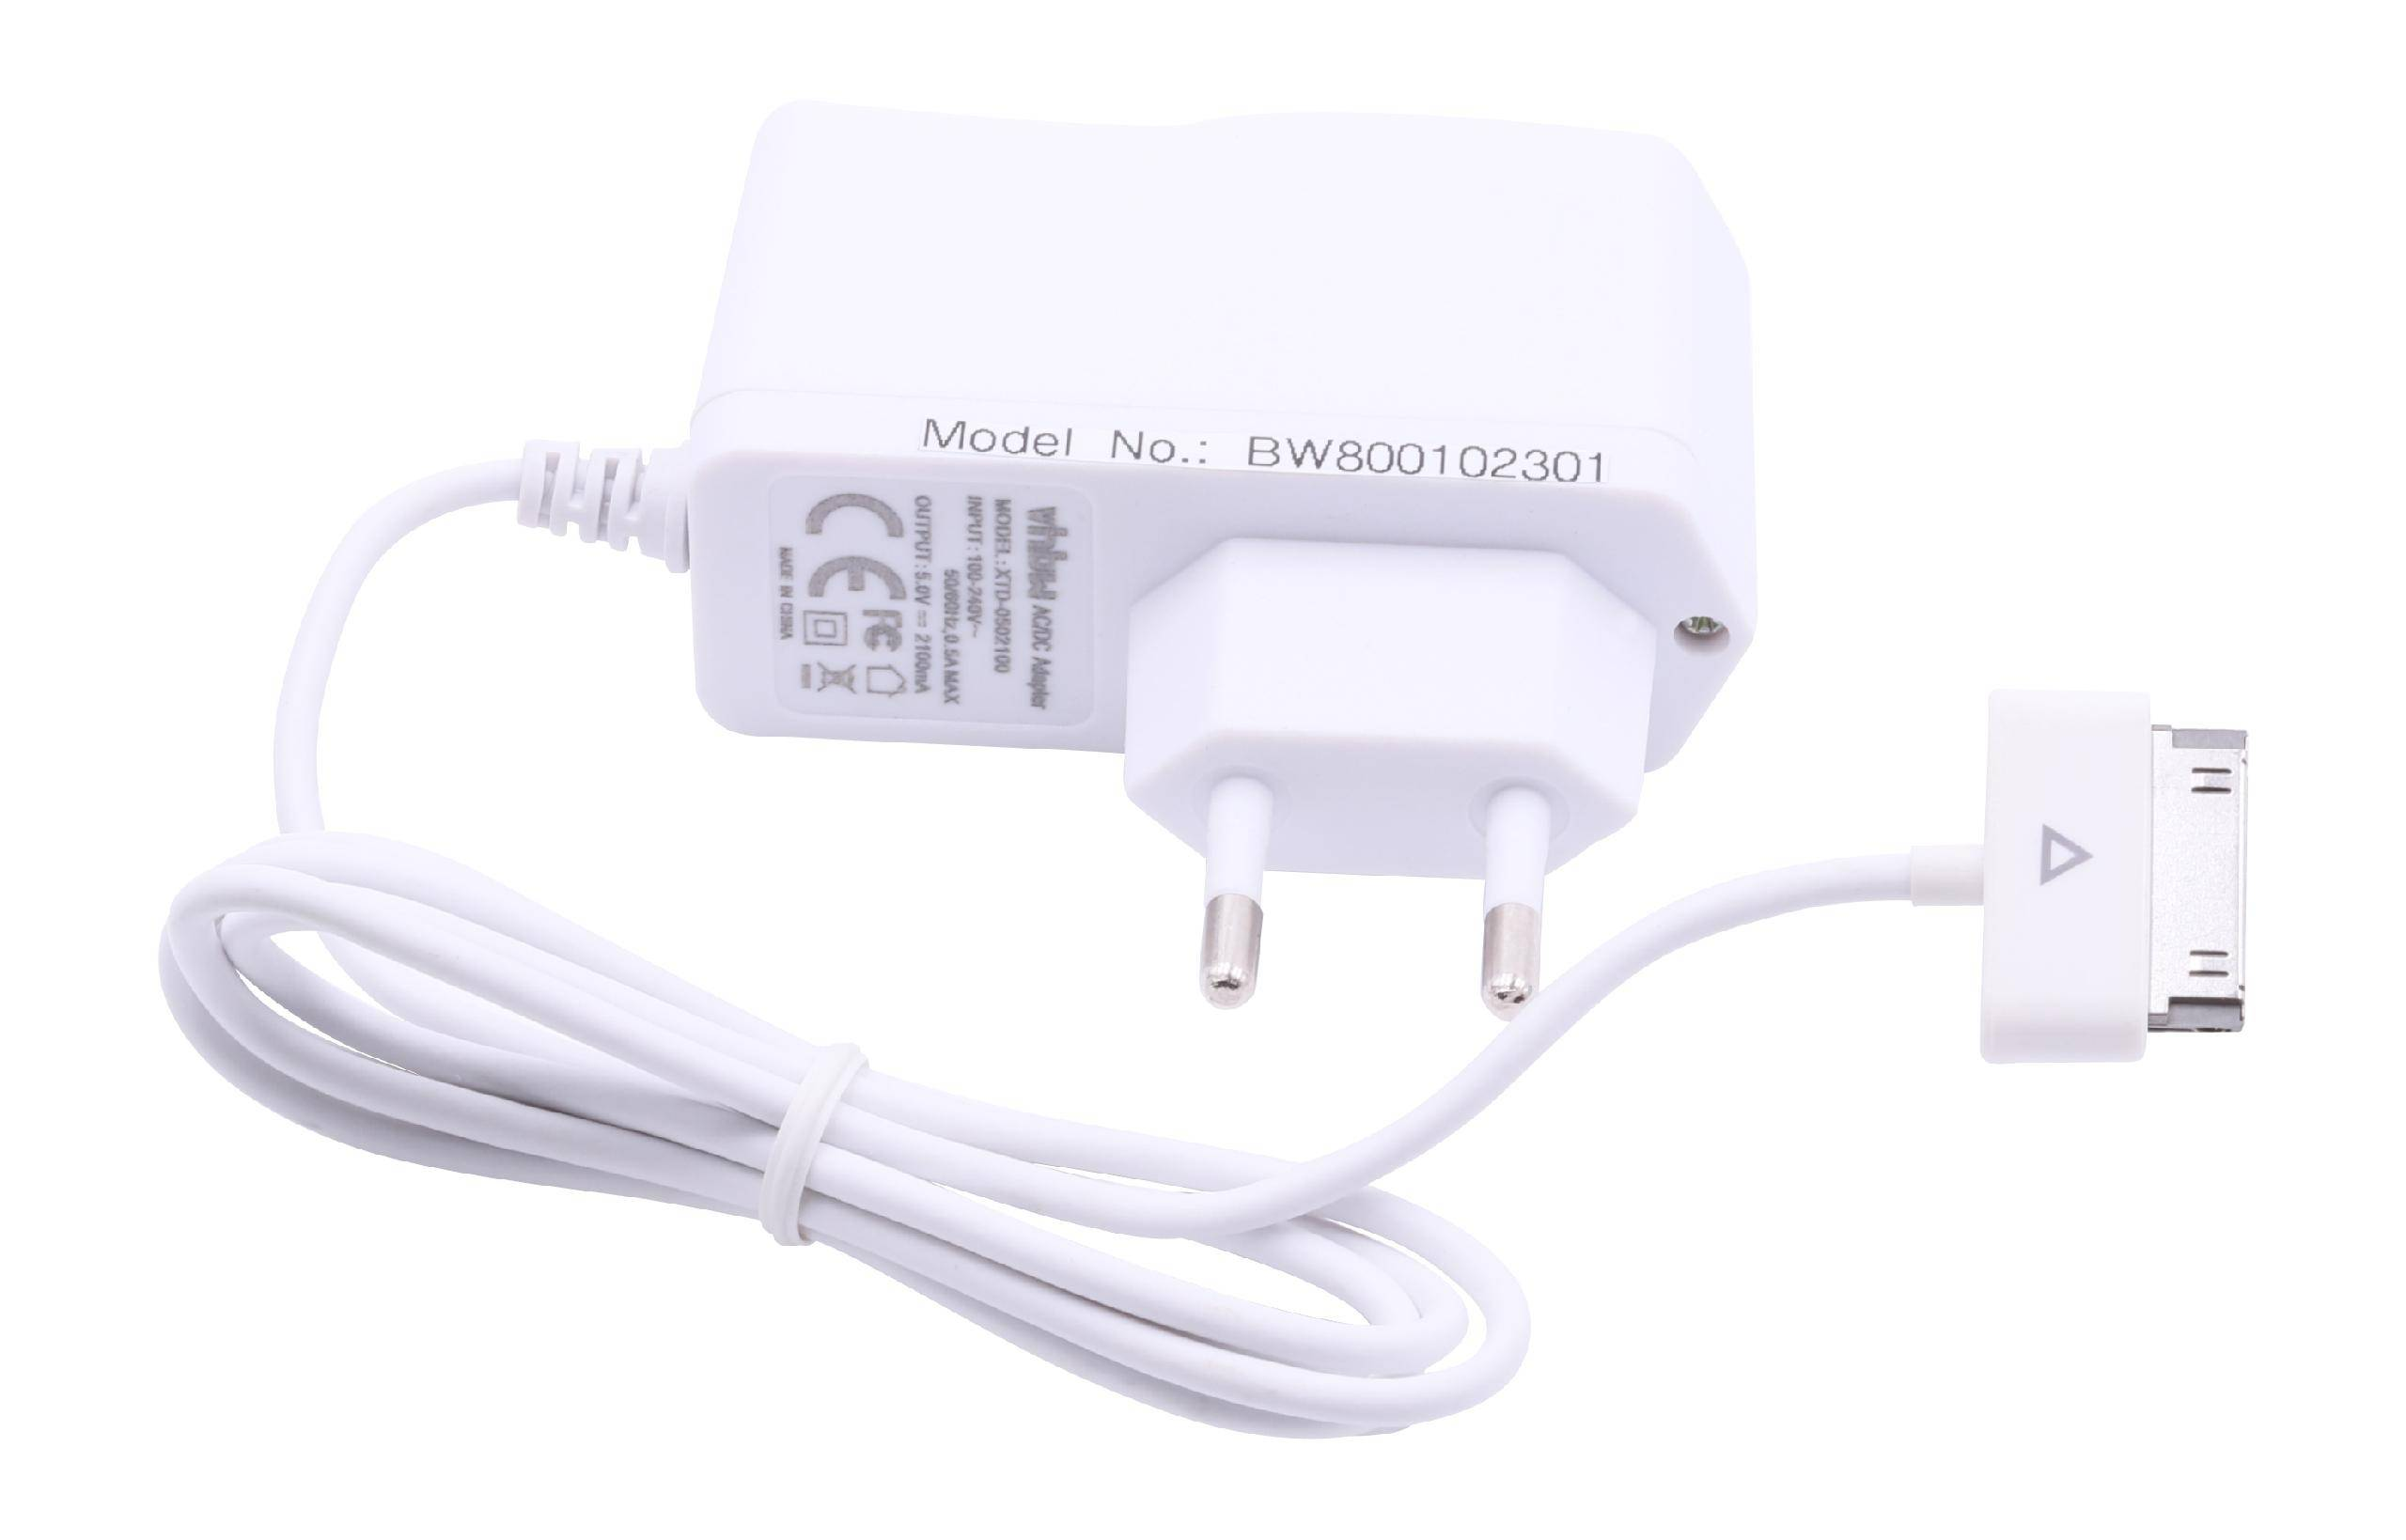 vhbw 220V Netzteil Ladegerät Ladekabel für Samsung Galaxy Tab 10.1, 2 10.1, 2 10.1 16GB, 2 10.1 32GB, 2 10.1 Wlan, 2 10.